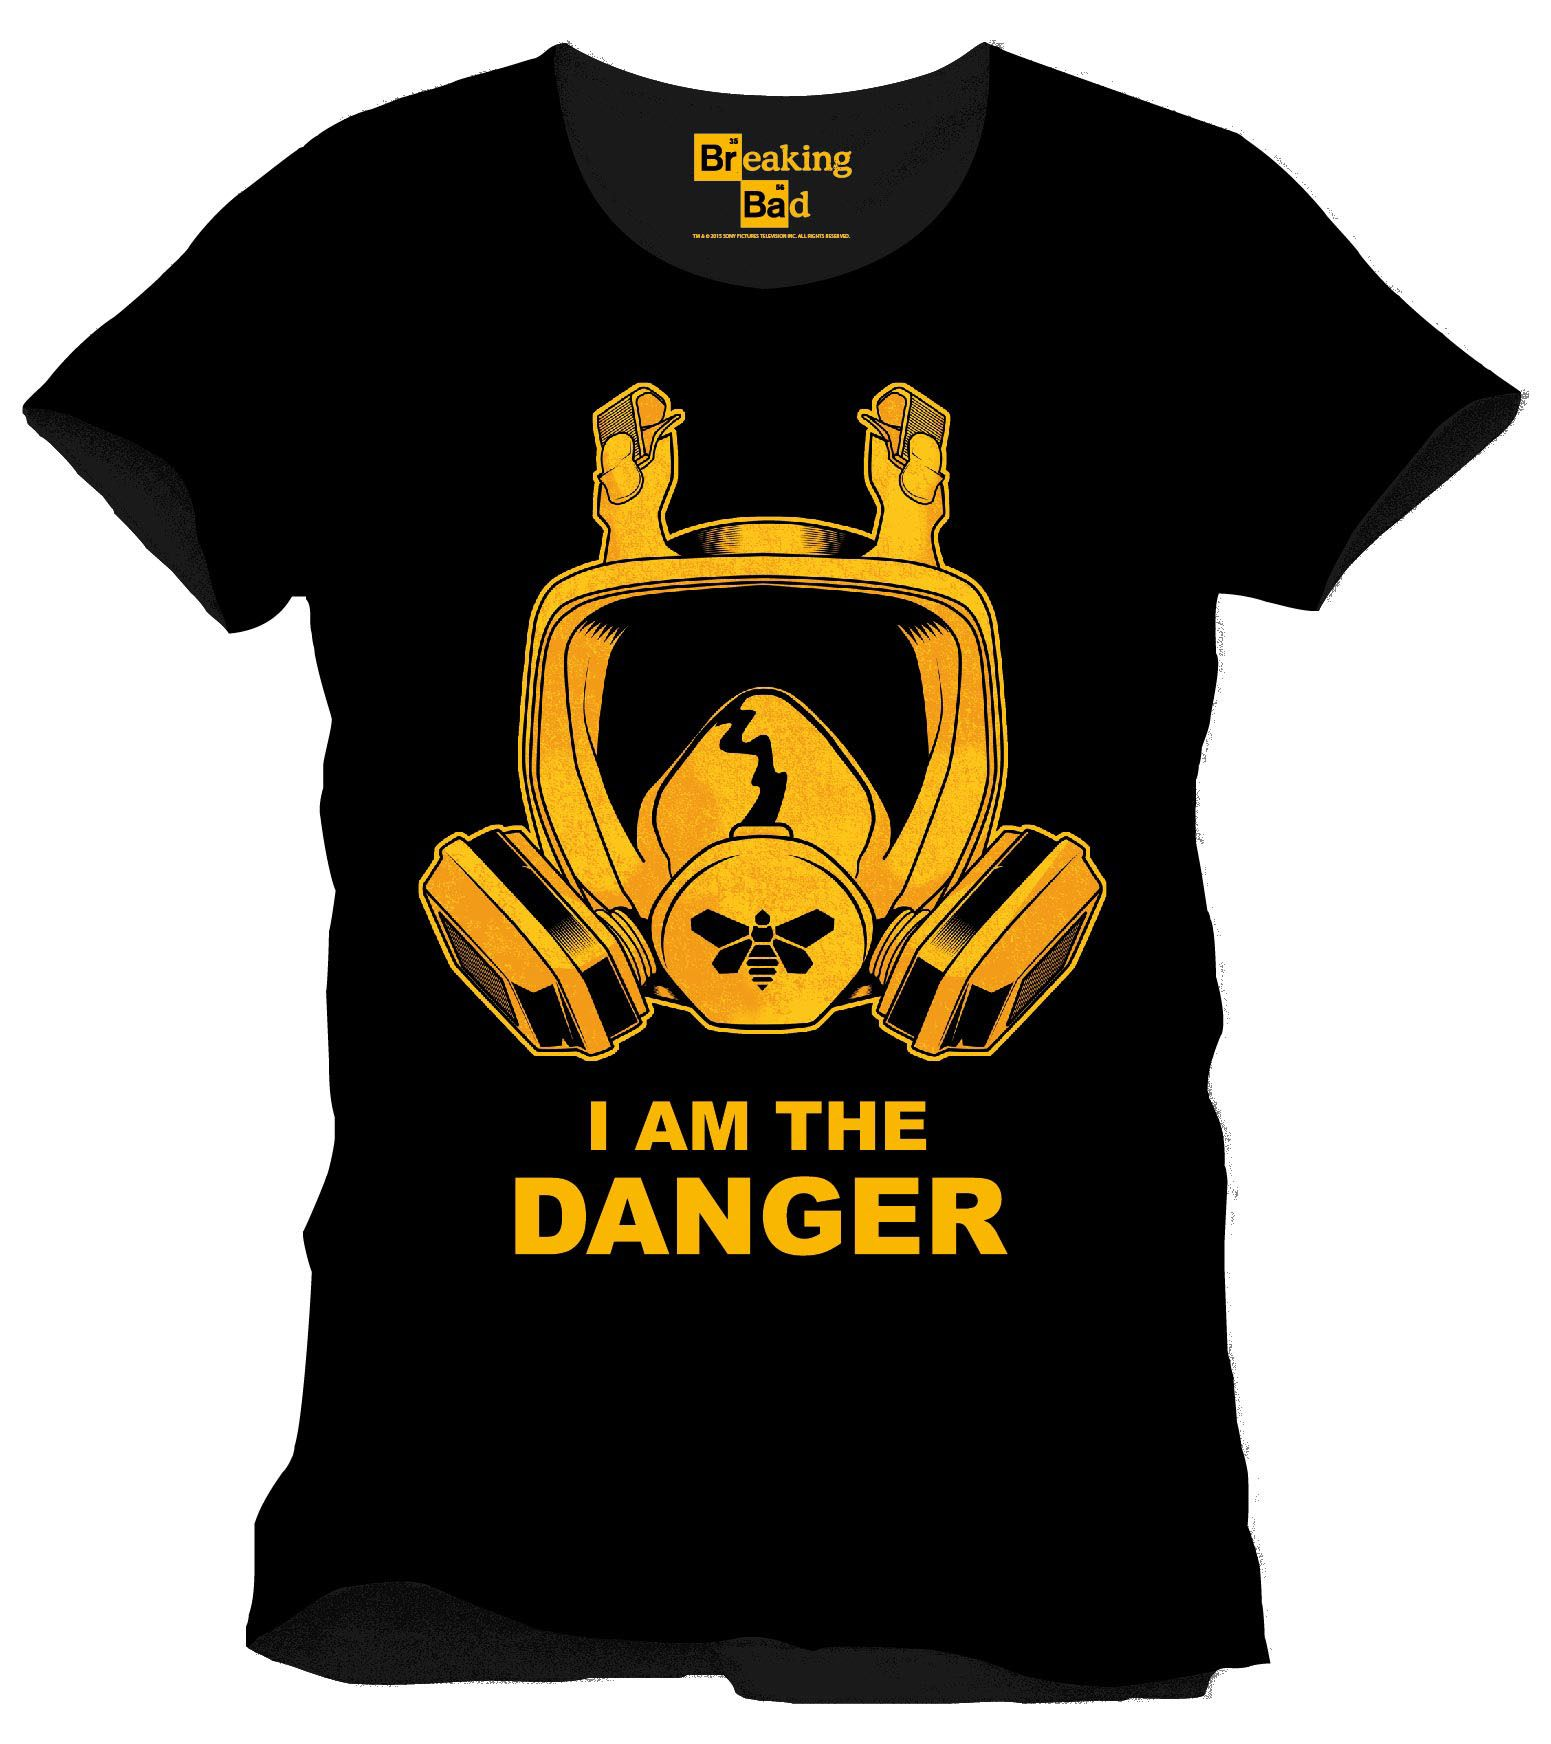 Breaking Bad T-Shirt I Am The Danger Size XL